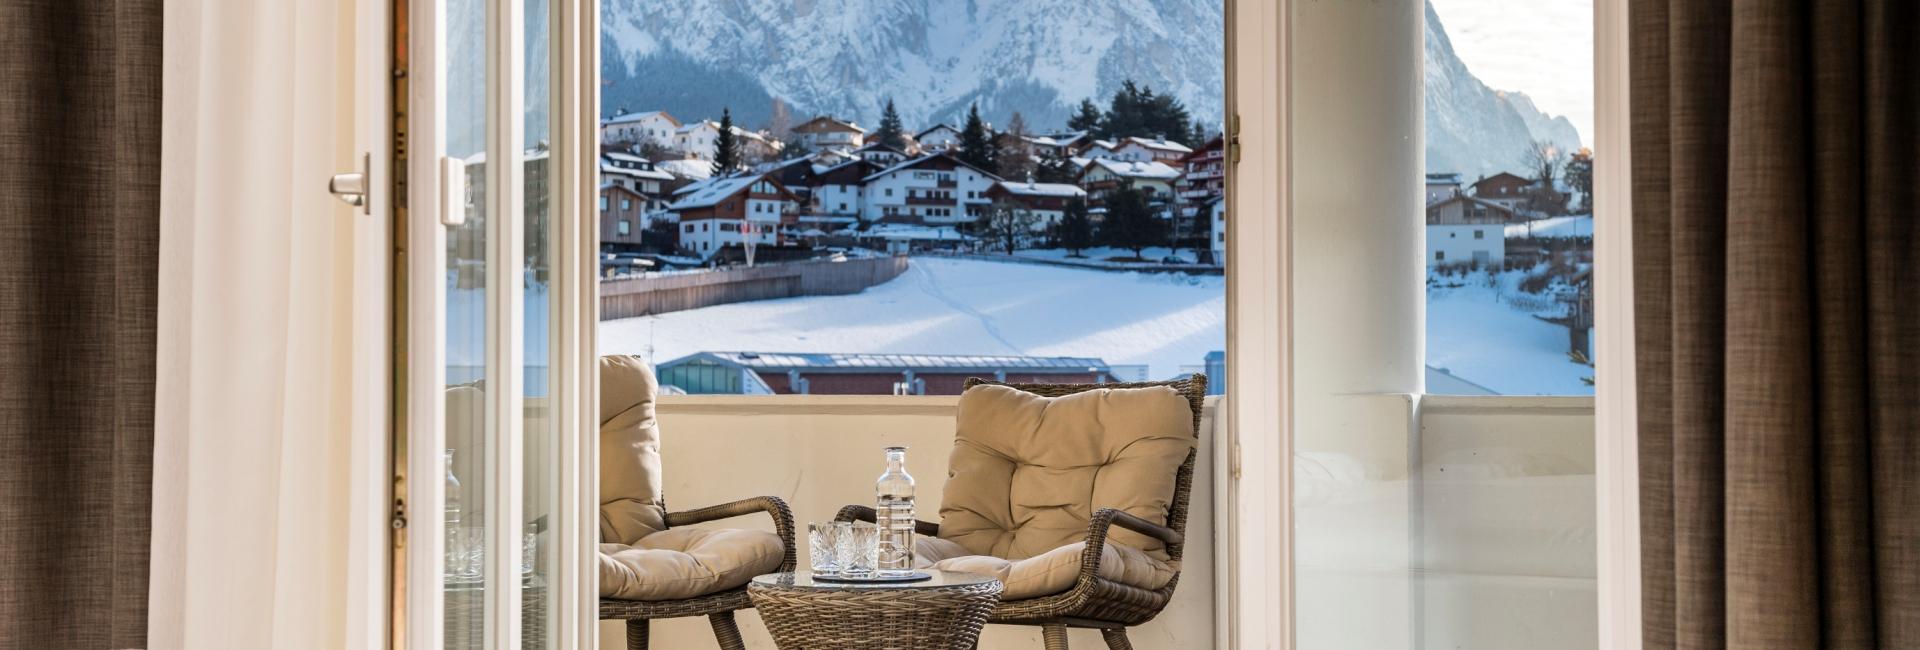 Hotel Villa Kastelruth, South Tyrol